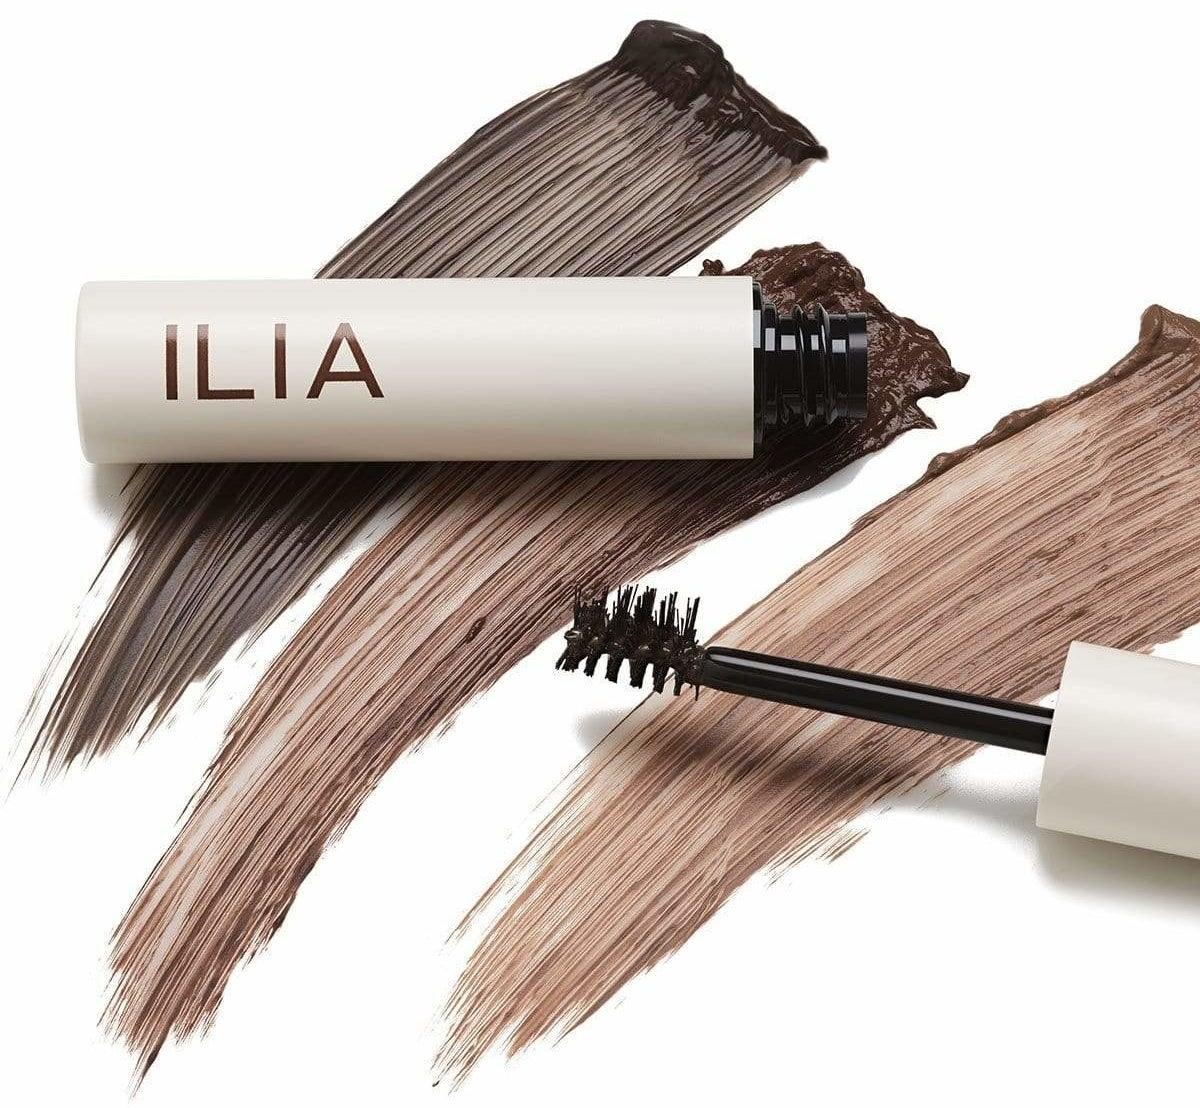 Ilia essential brow gel